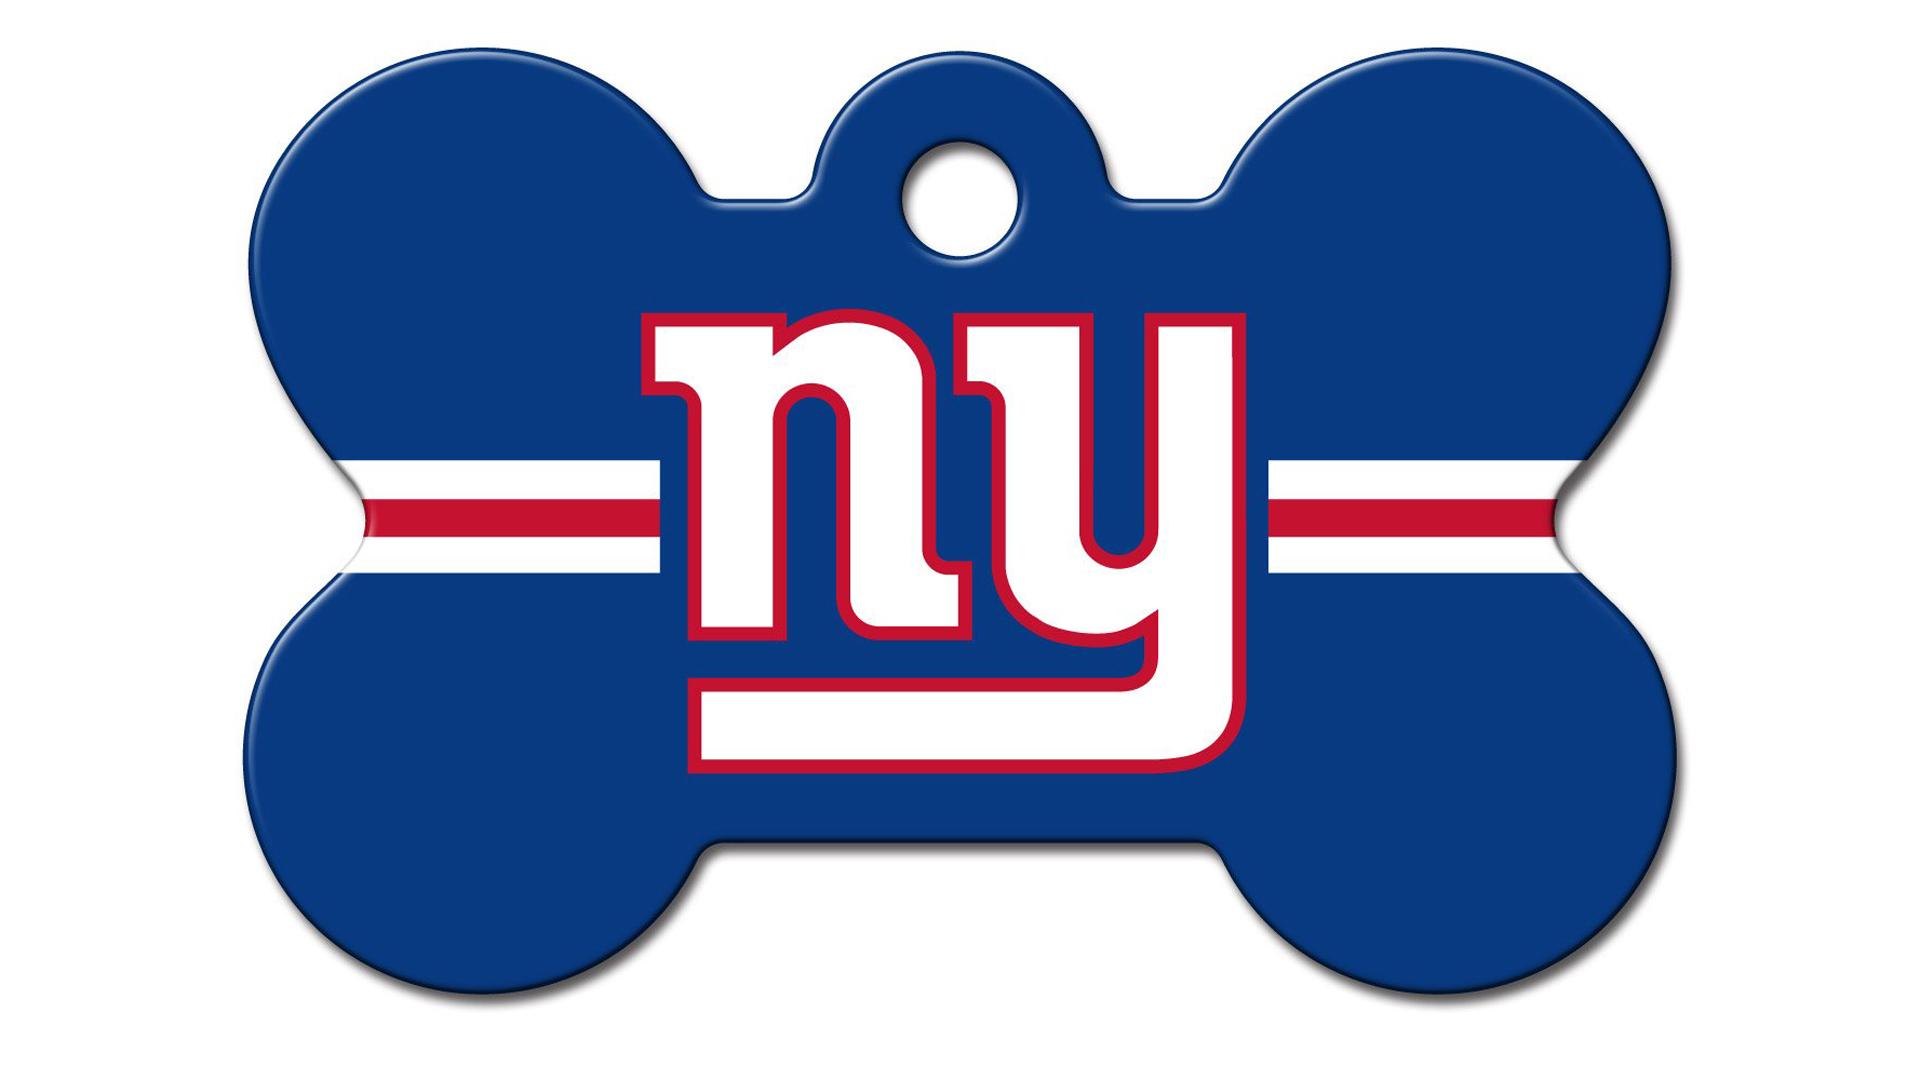 New York Giants Wallpapers